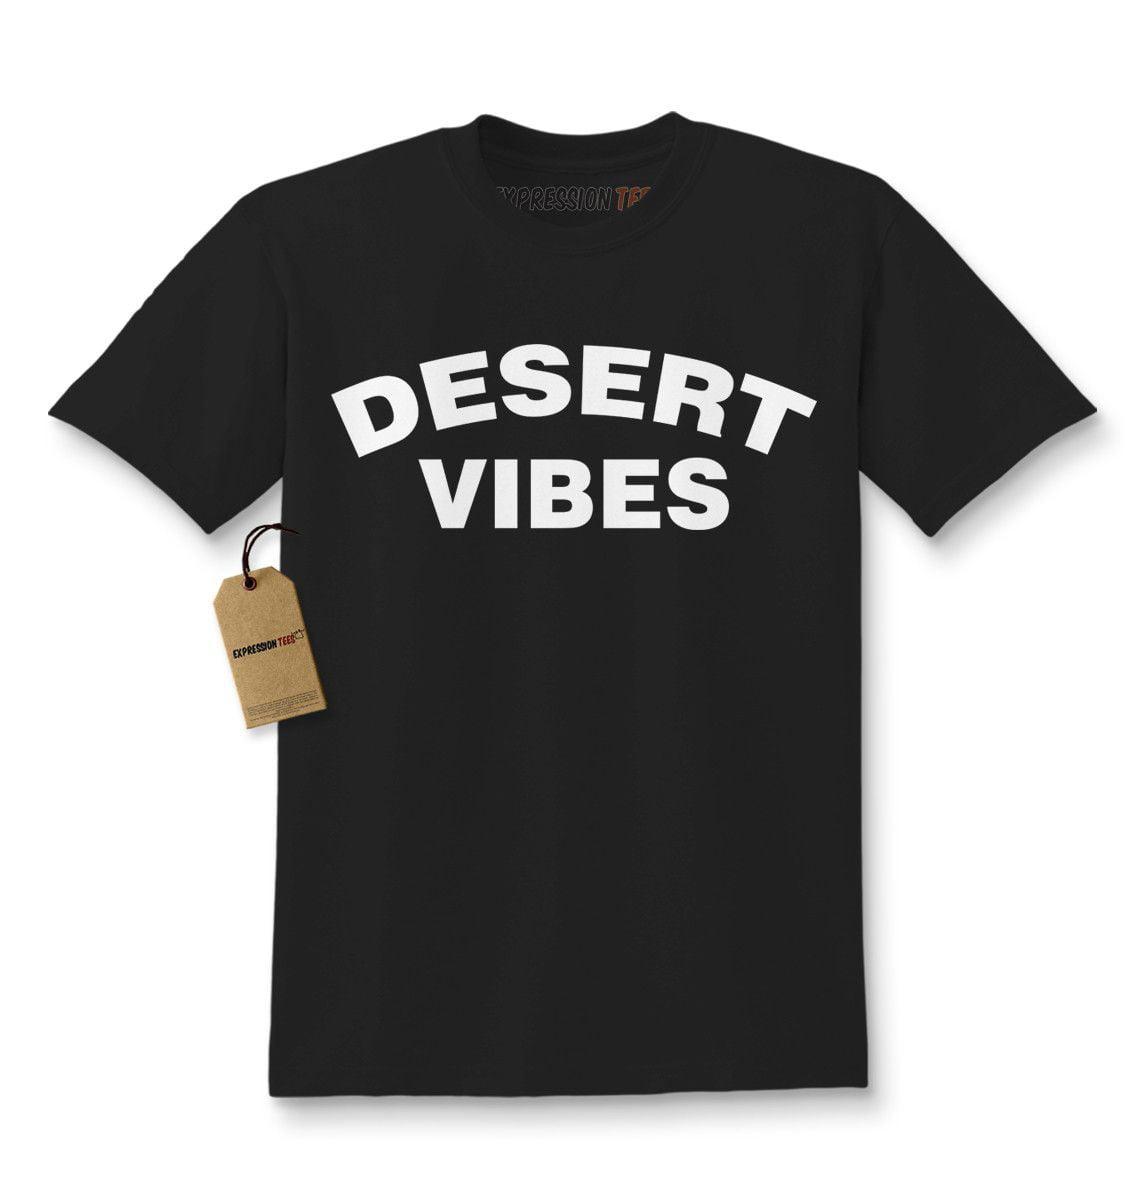 Desert Vibes Kids T-shirt